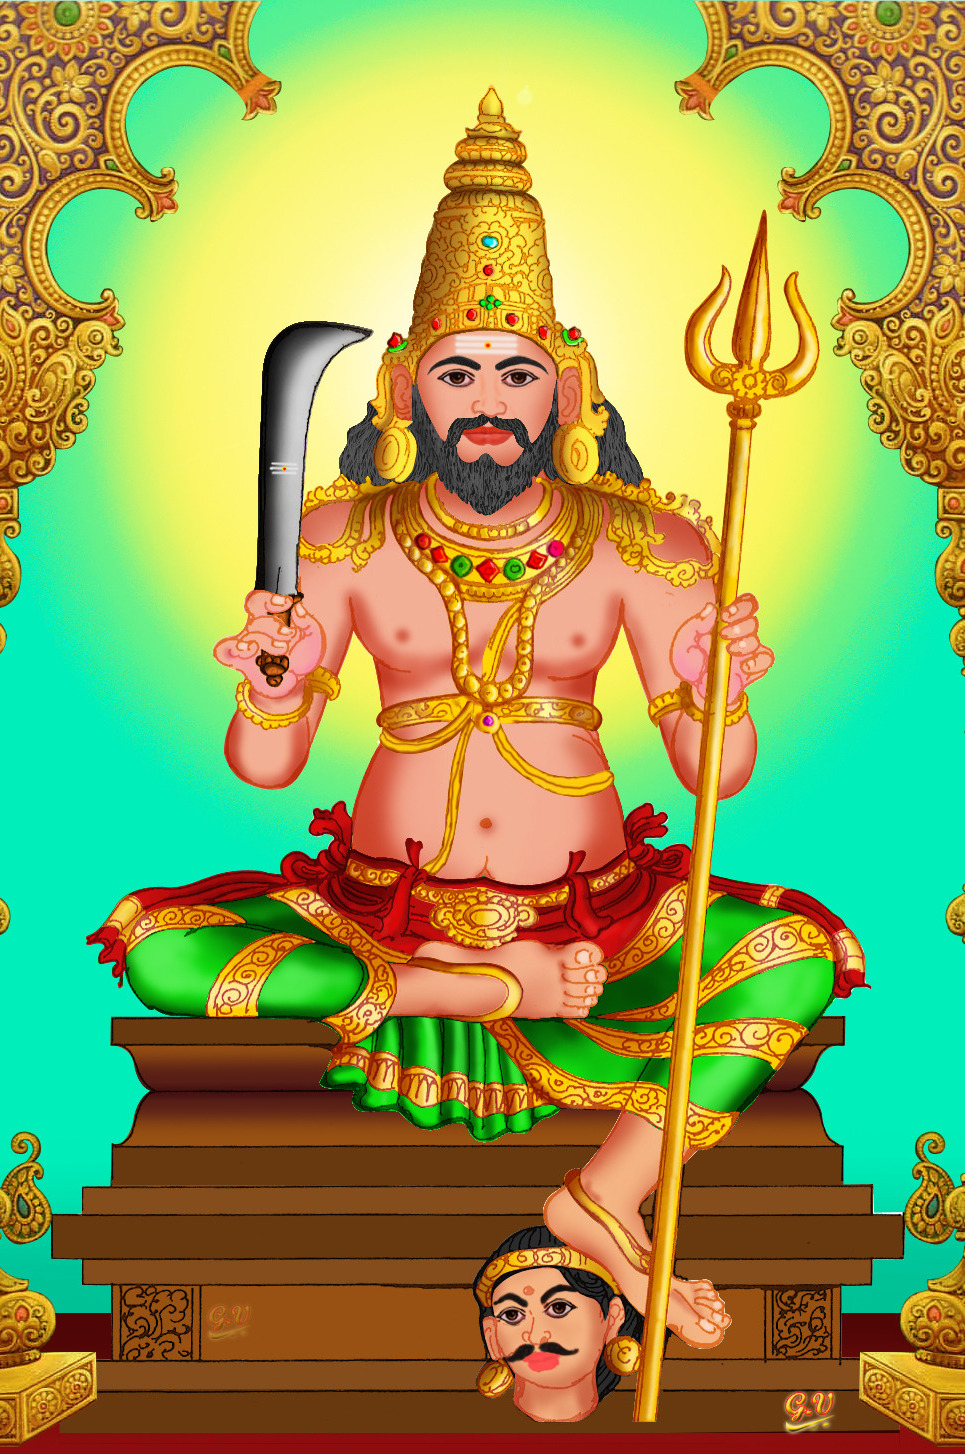 Sri muneeswaran 1 show